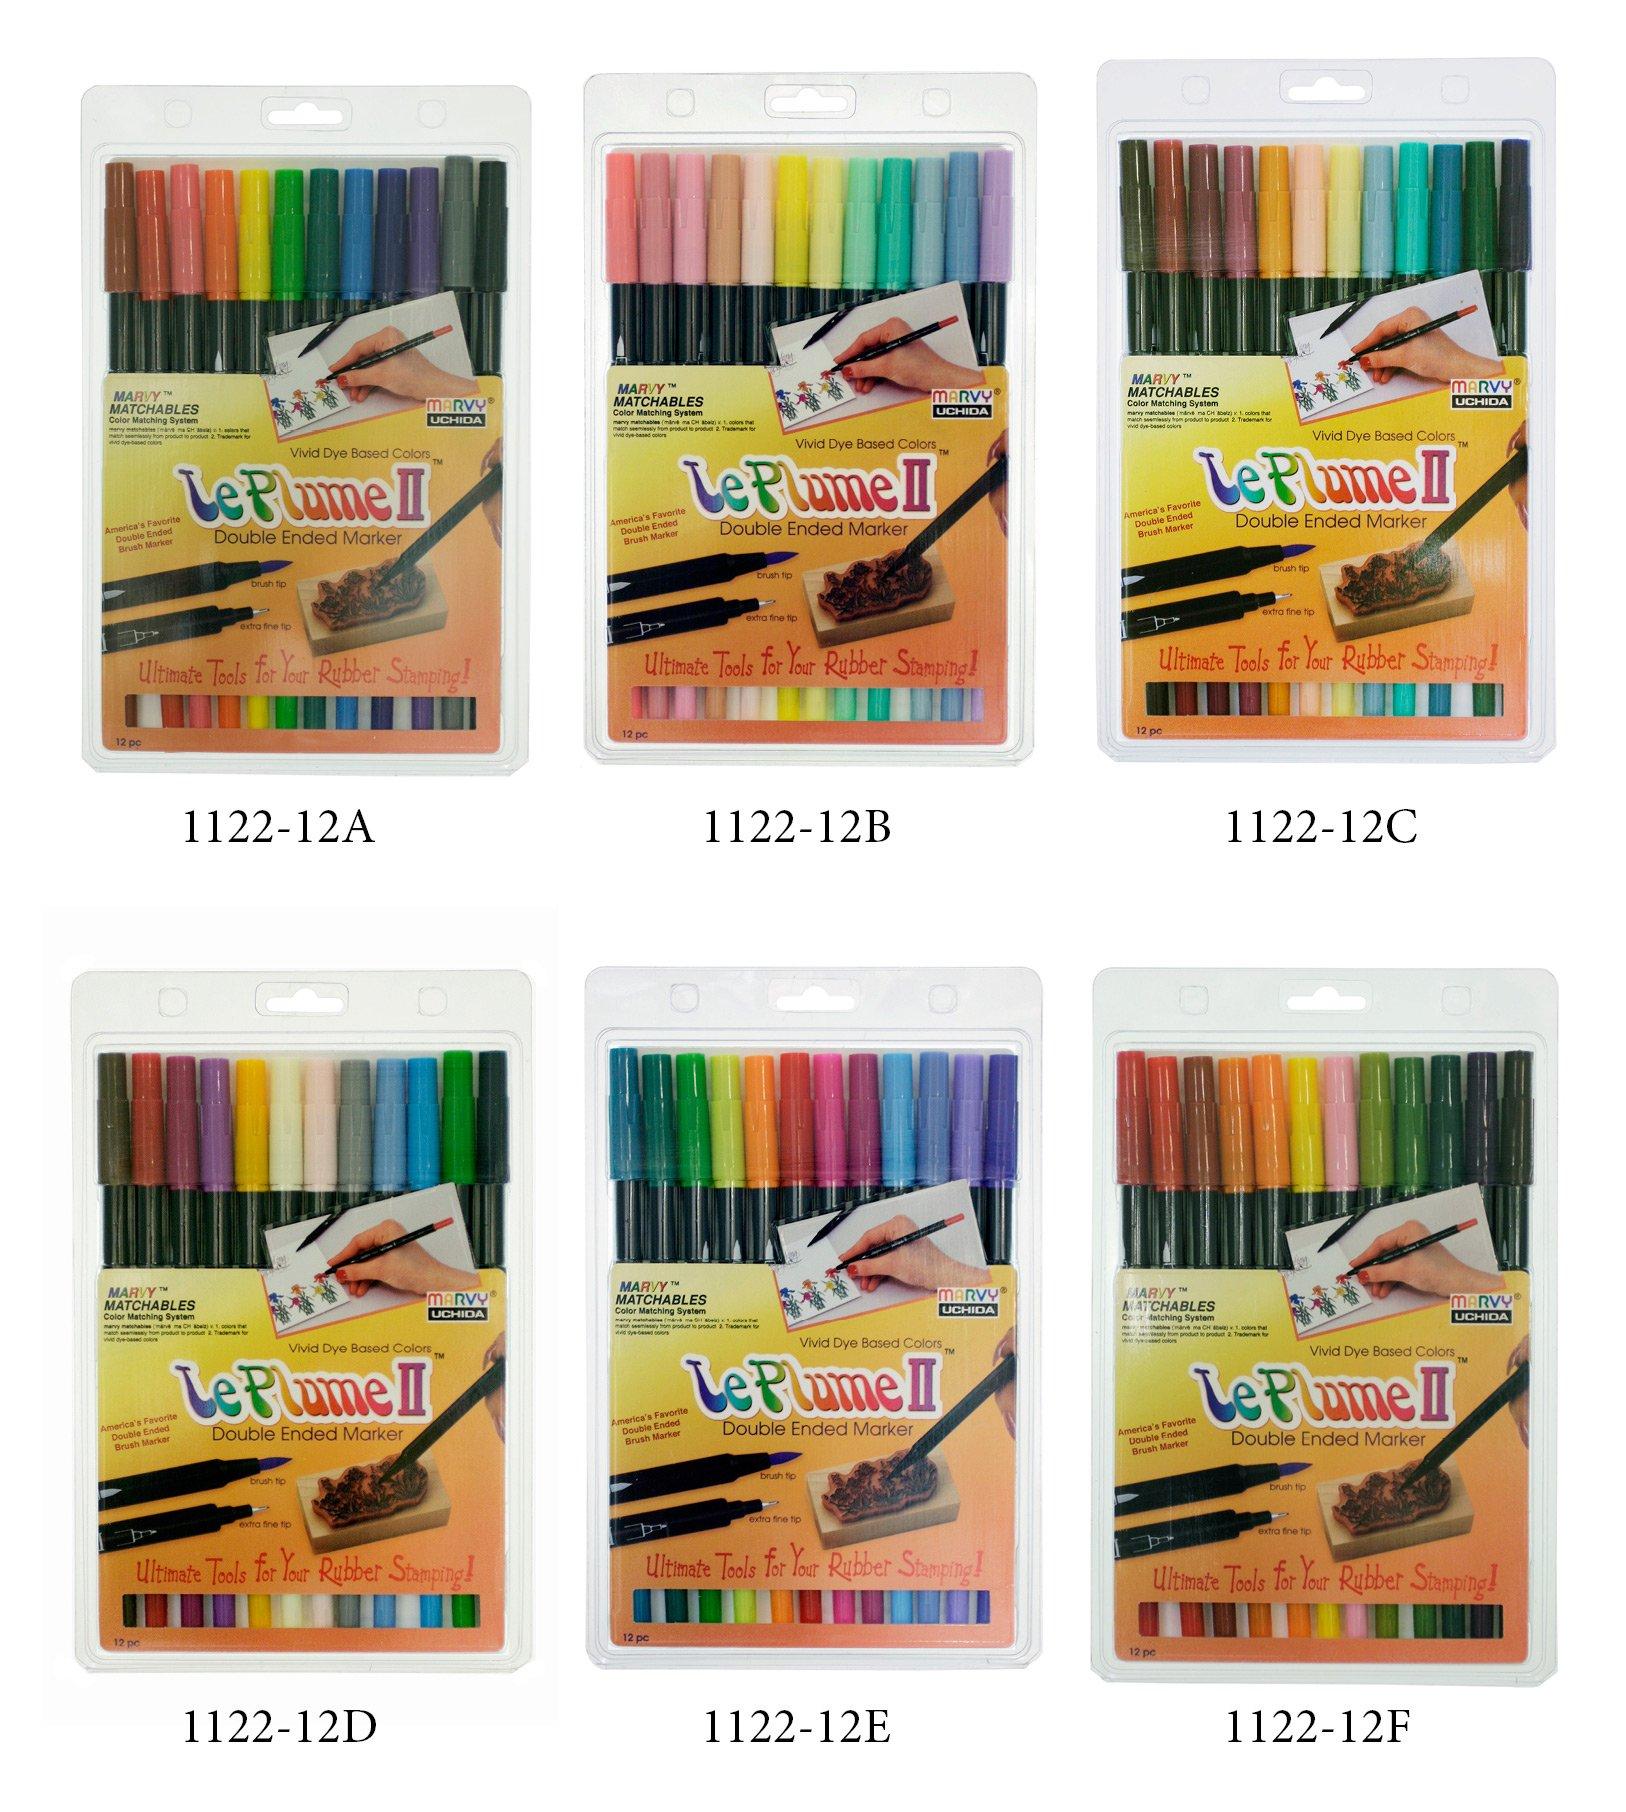 Uchida of America Large Bundle Set of 6 Le Plume II- 72 Pen Set, 1122-12A, 1122-12B, 1122-12C, 1122-12D, 1122-12E, 1122-12F